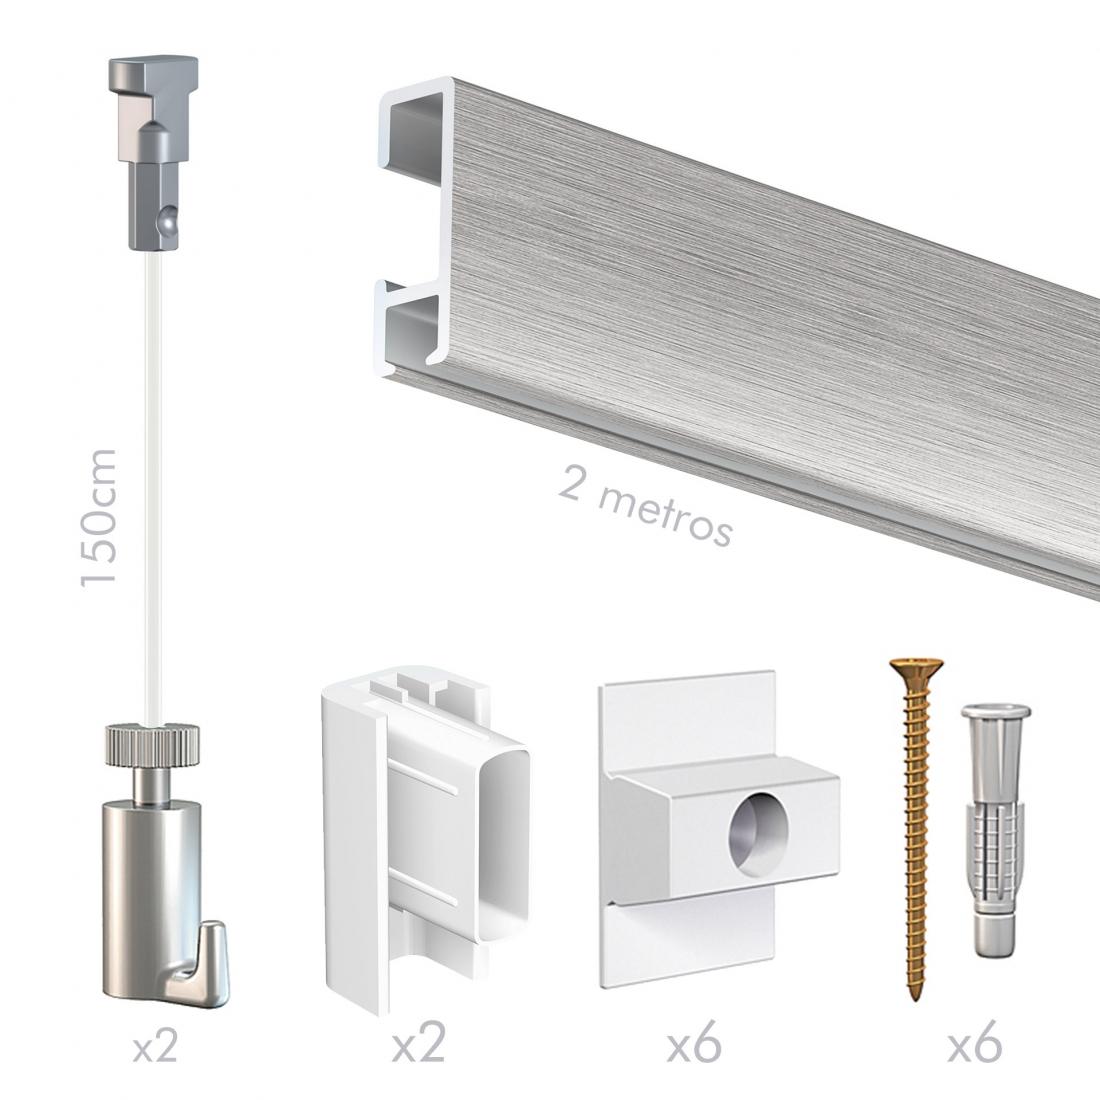 kit tira perfil riel guia para colgar cuadros sin hacer agujeros Aluminio, de pared, artiteq